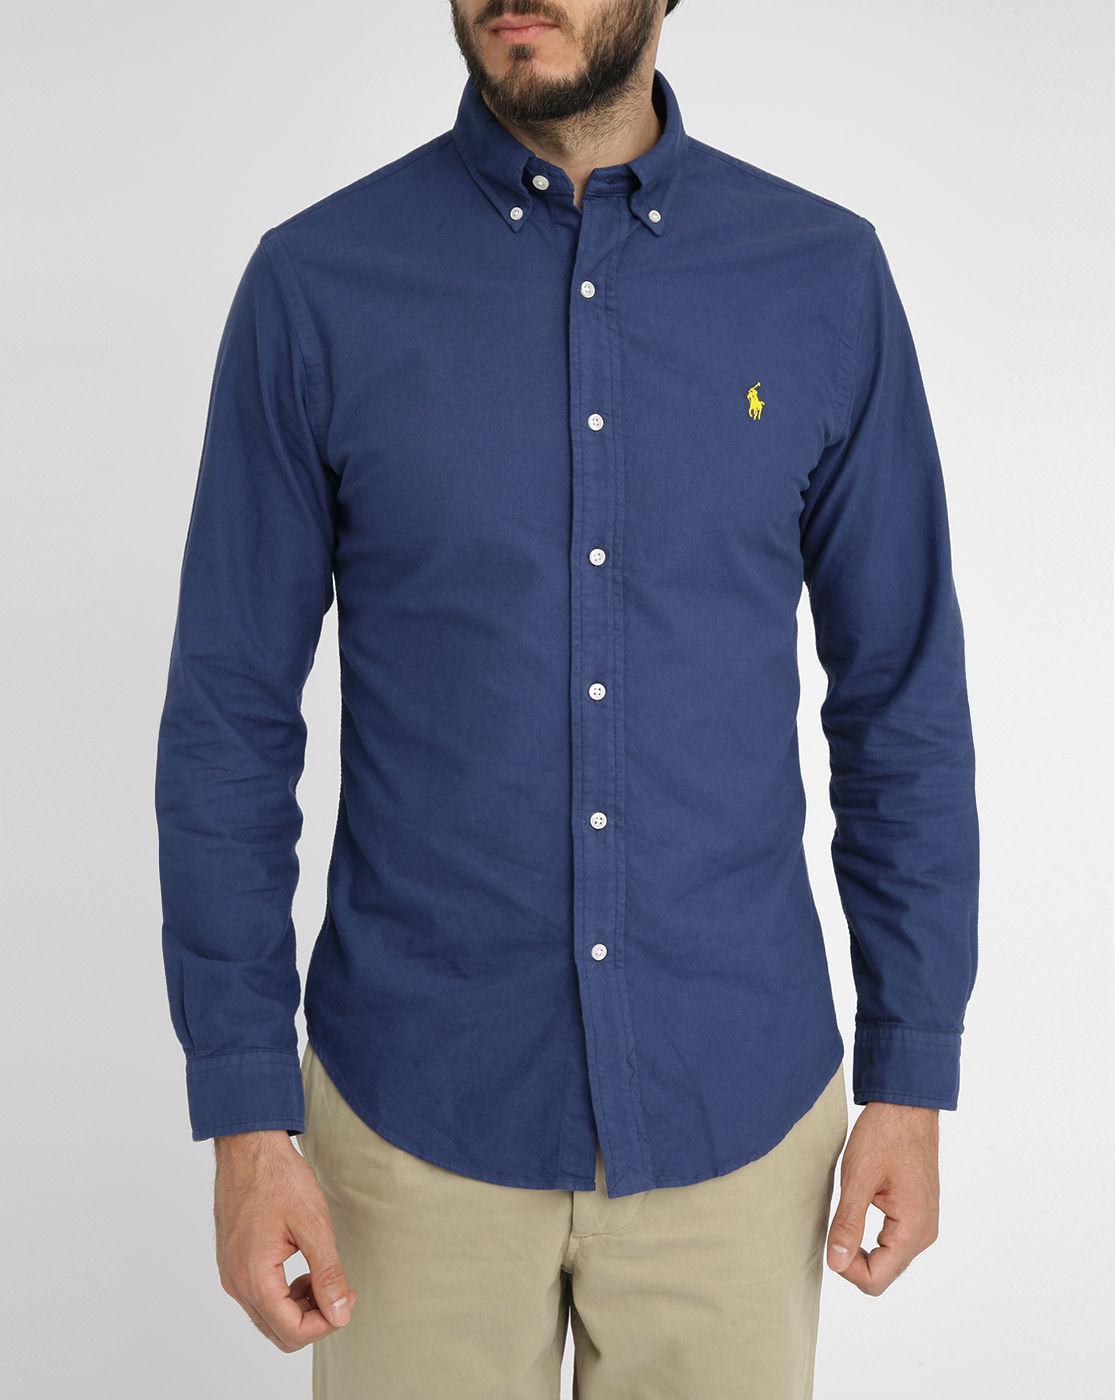 Polo Ralph Lauren Navy Newport Oxford Slim Fit Shirt In